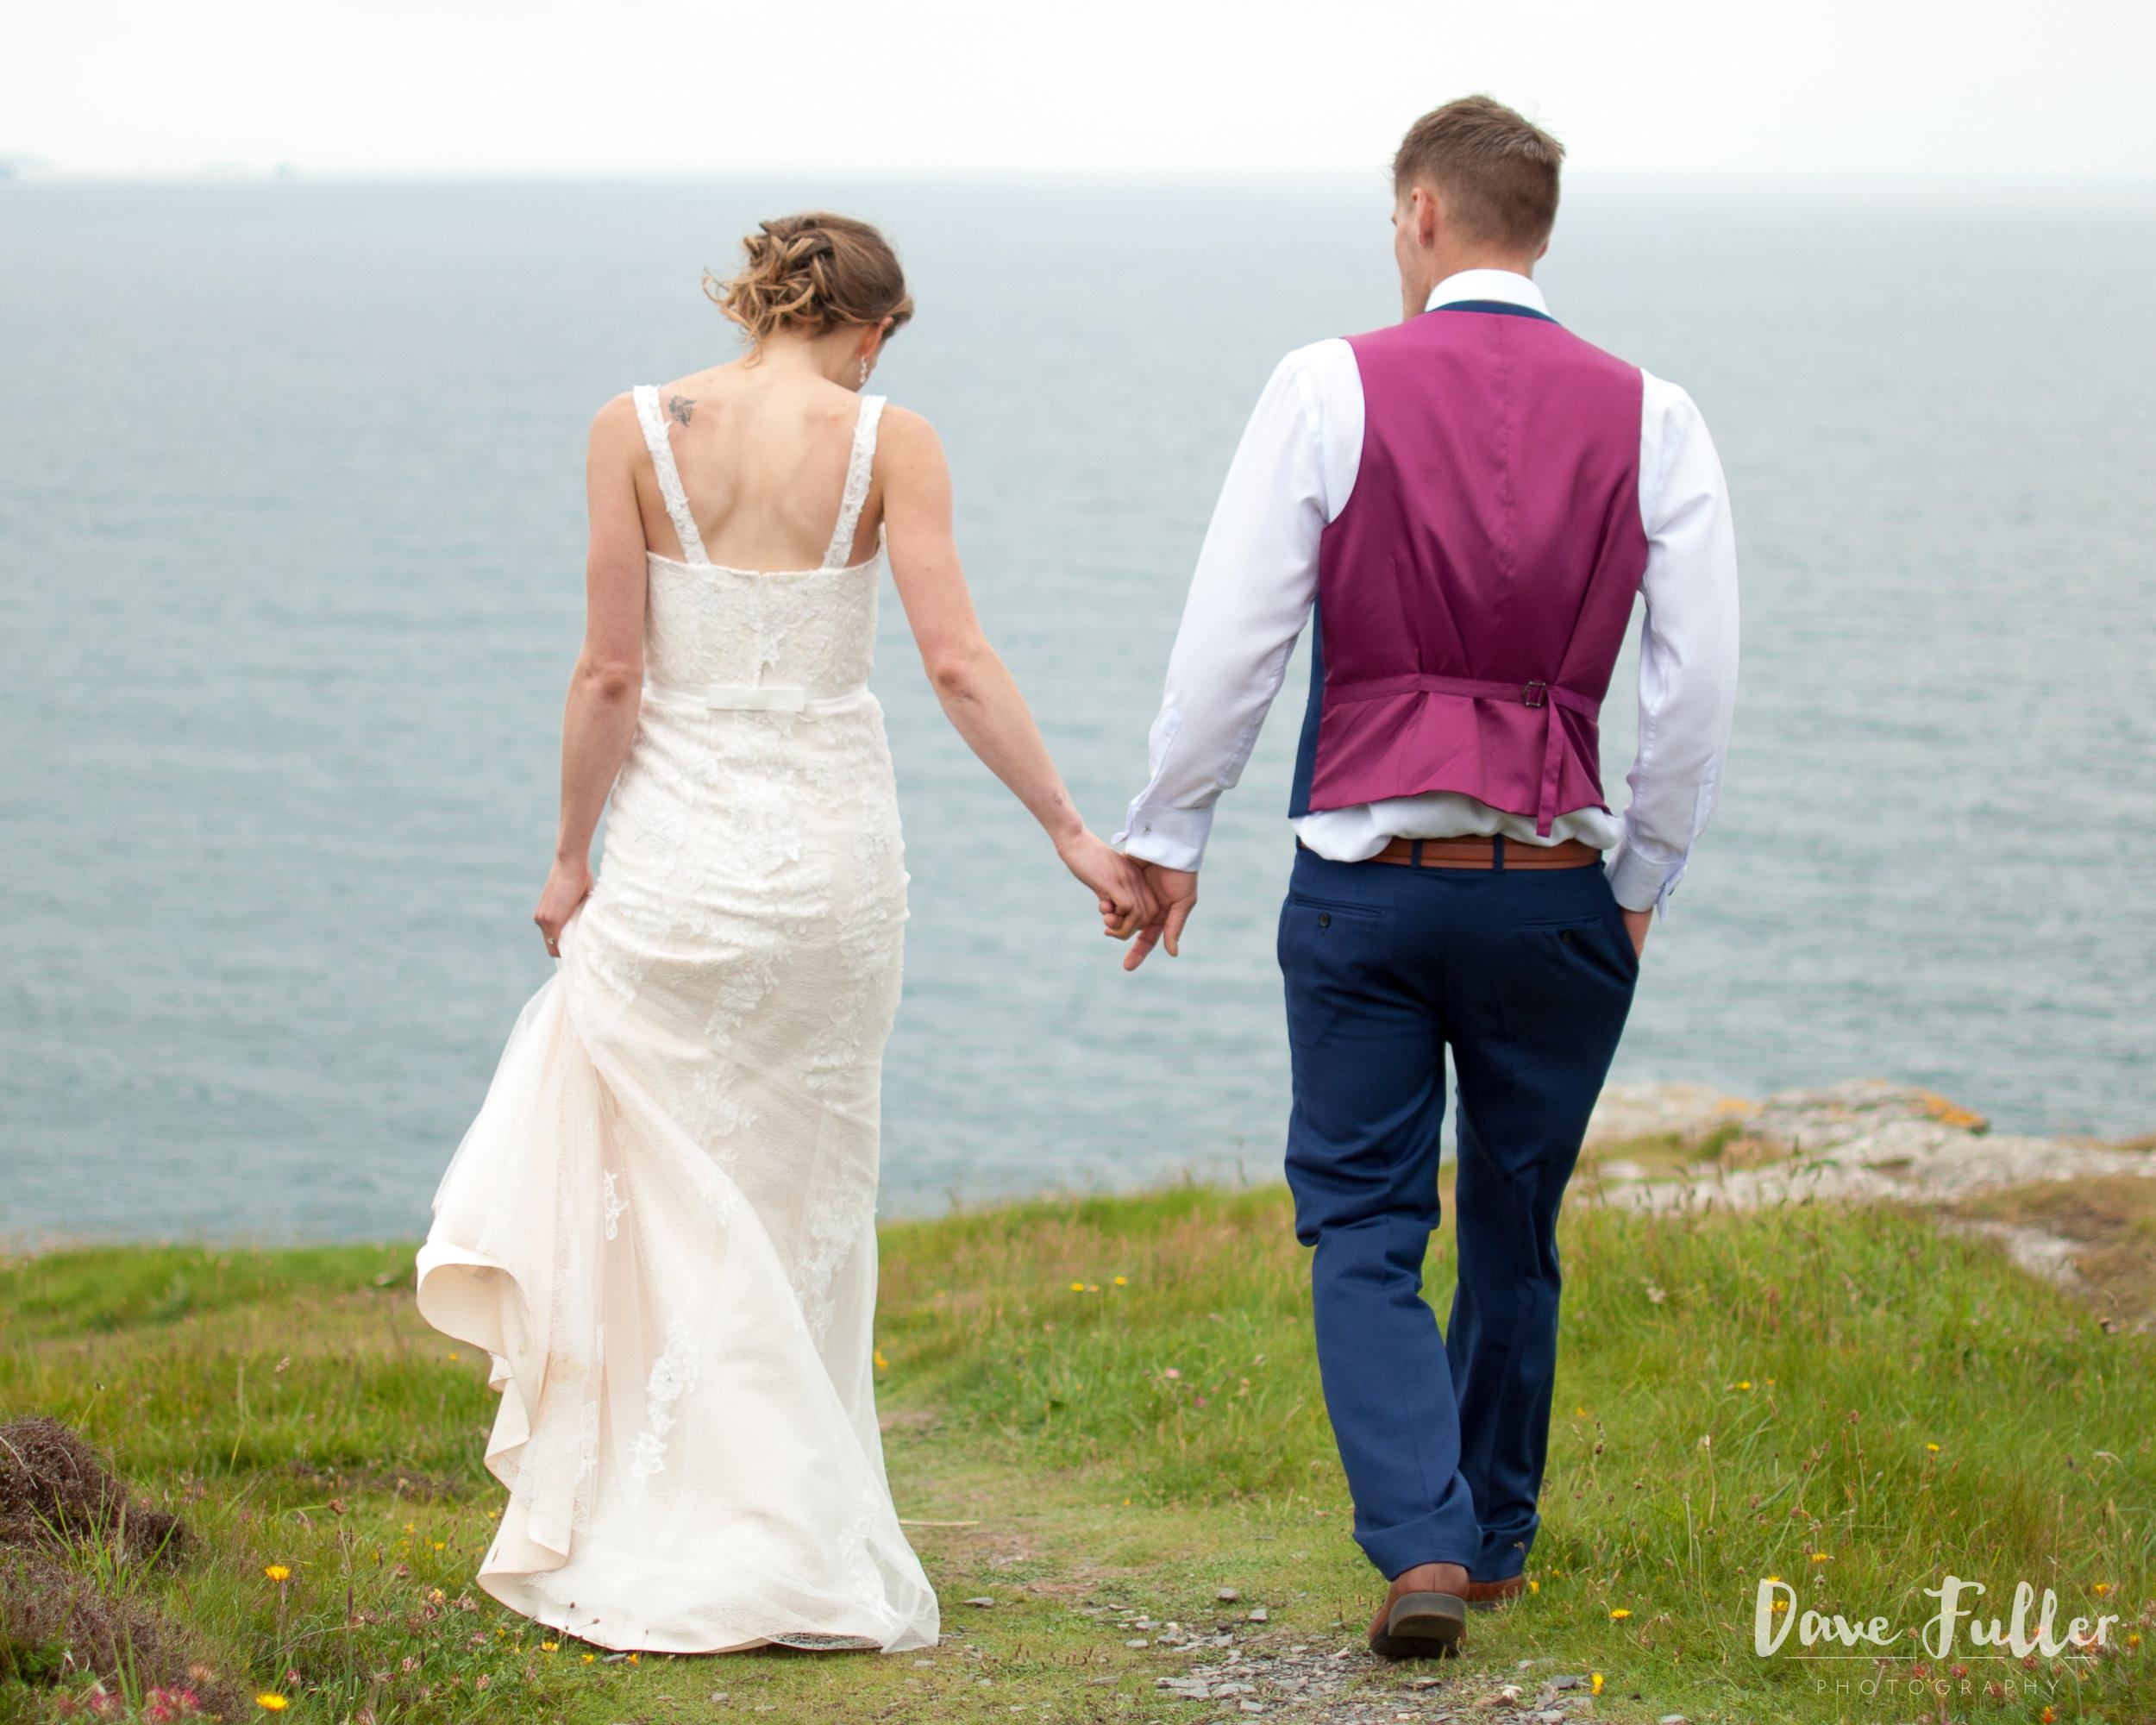 Nottingham Wedding Photographer - ward-0622.jpg